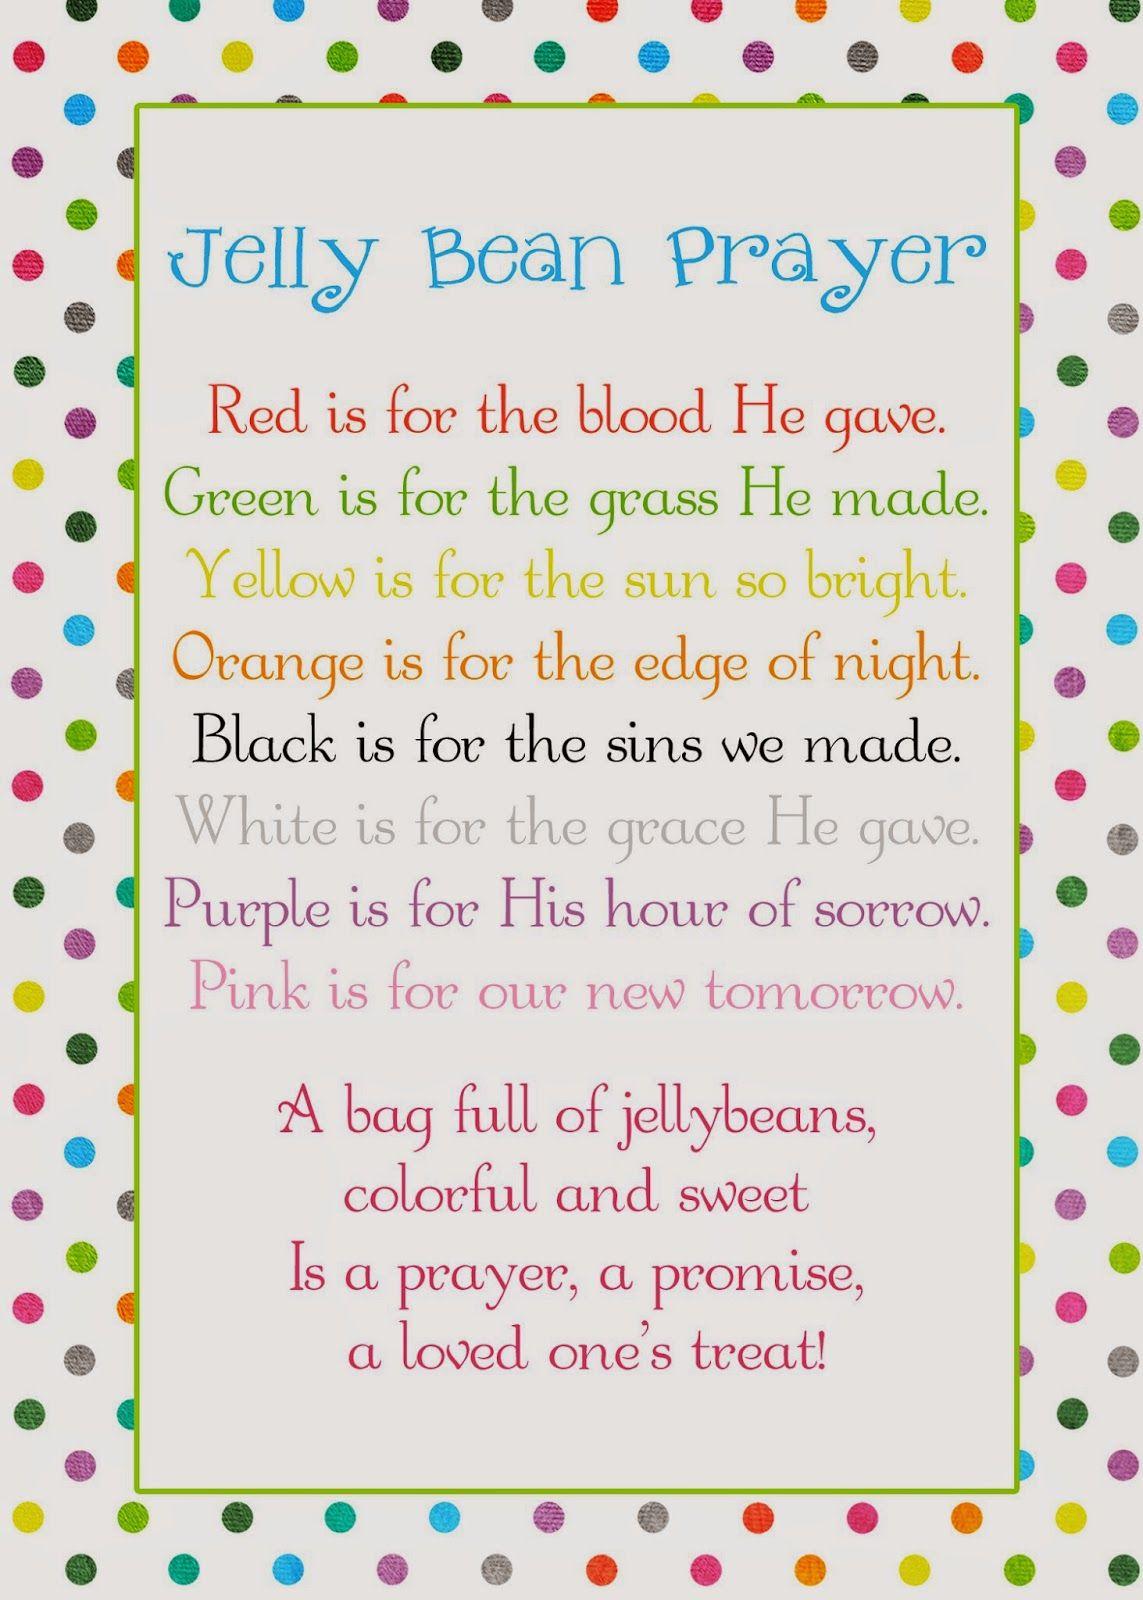 A pocket full of lds prints jelly bean prayer poem easter freebie a pocket full of lds prints jelly bean prayer poem easter freebie negle Choice Image